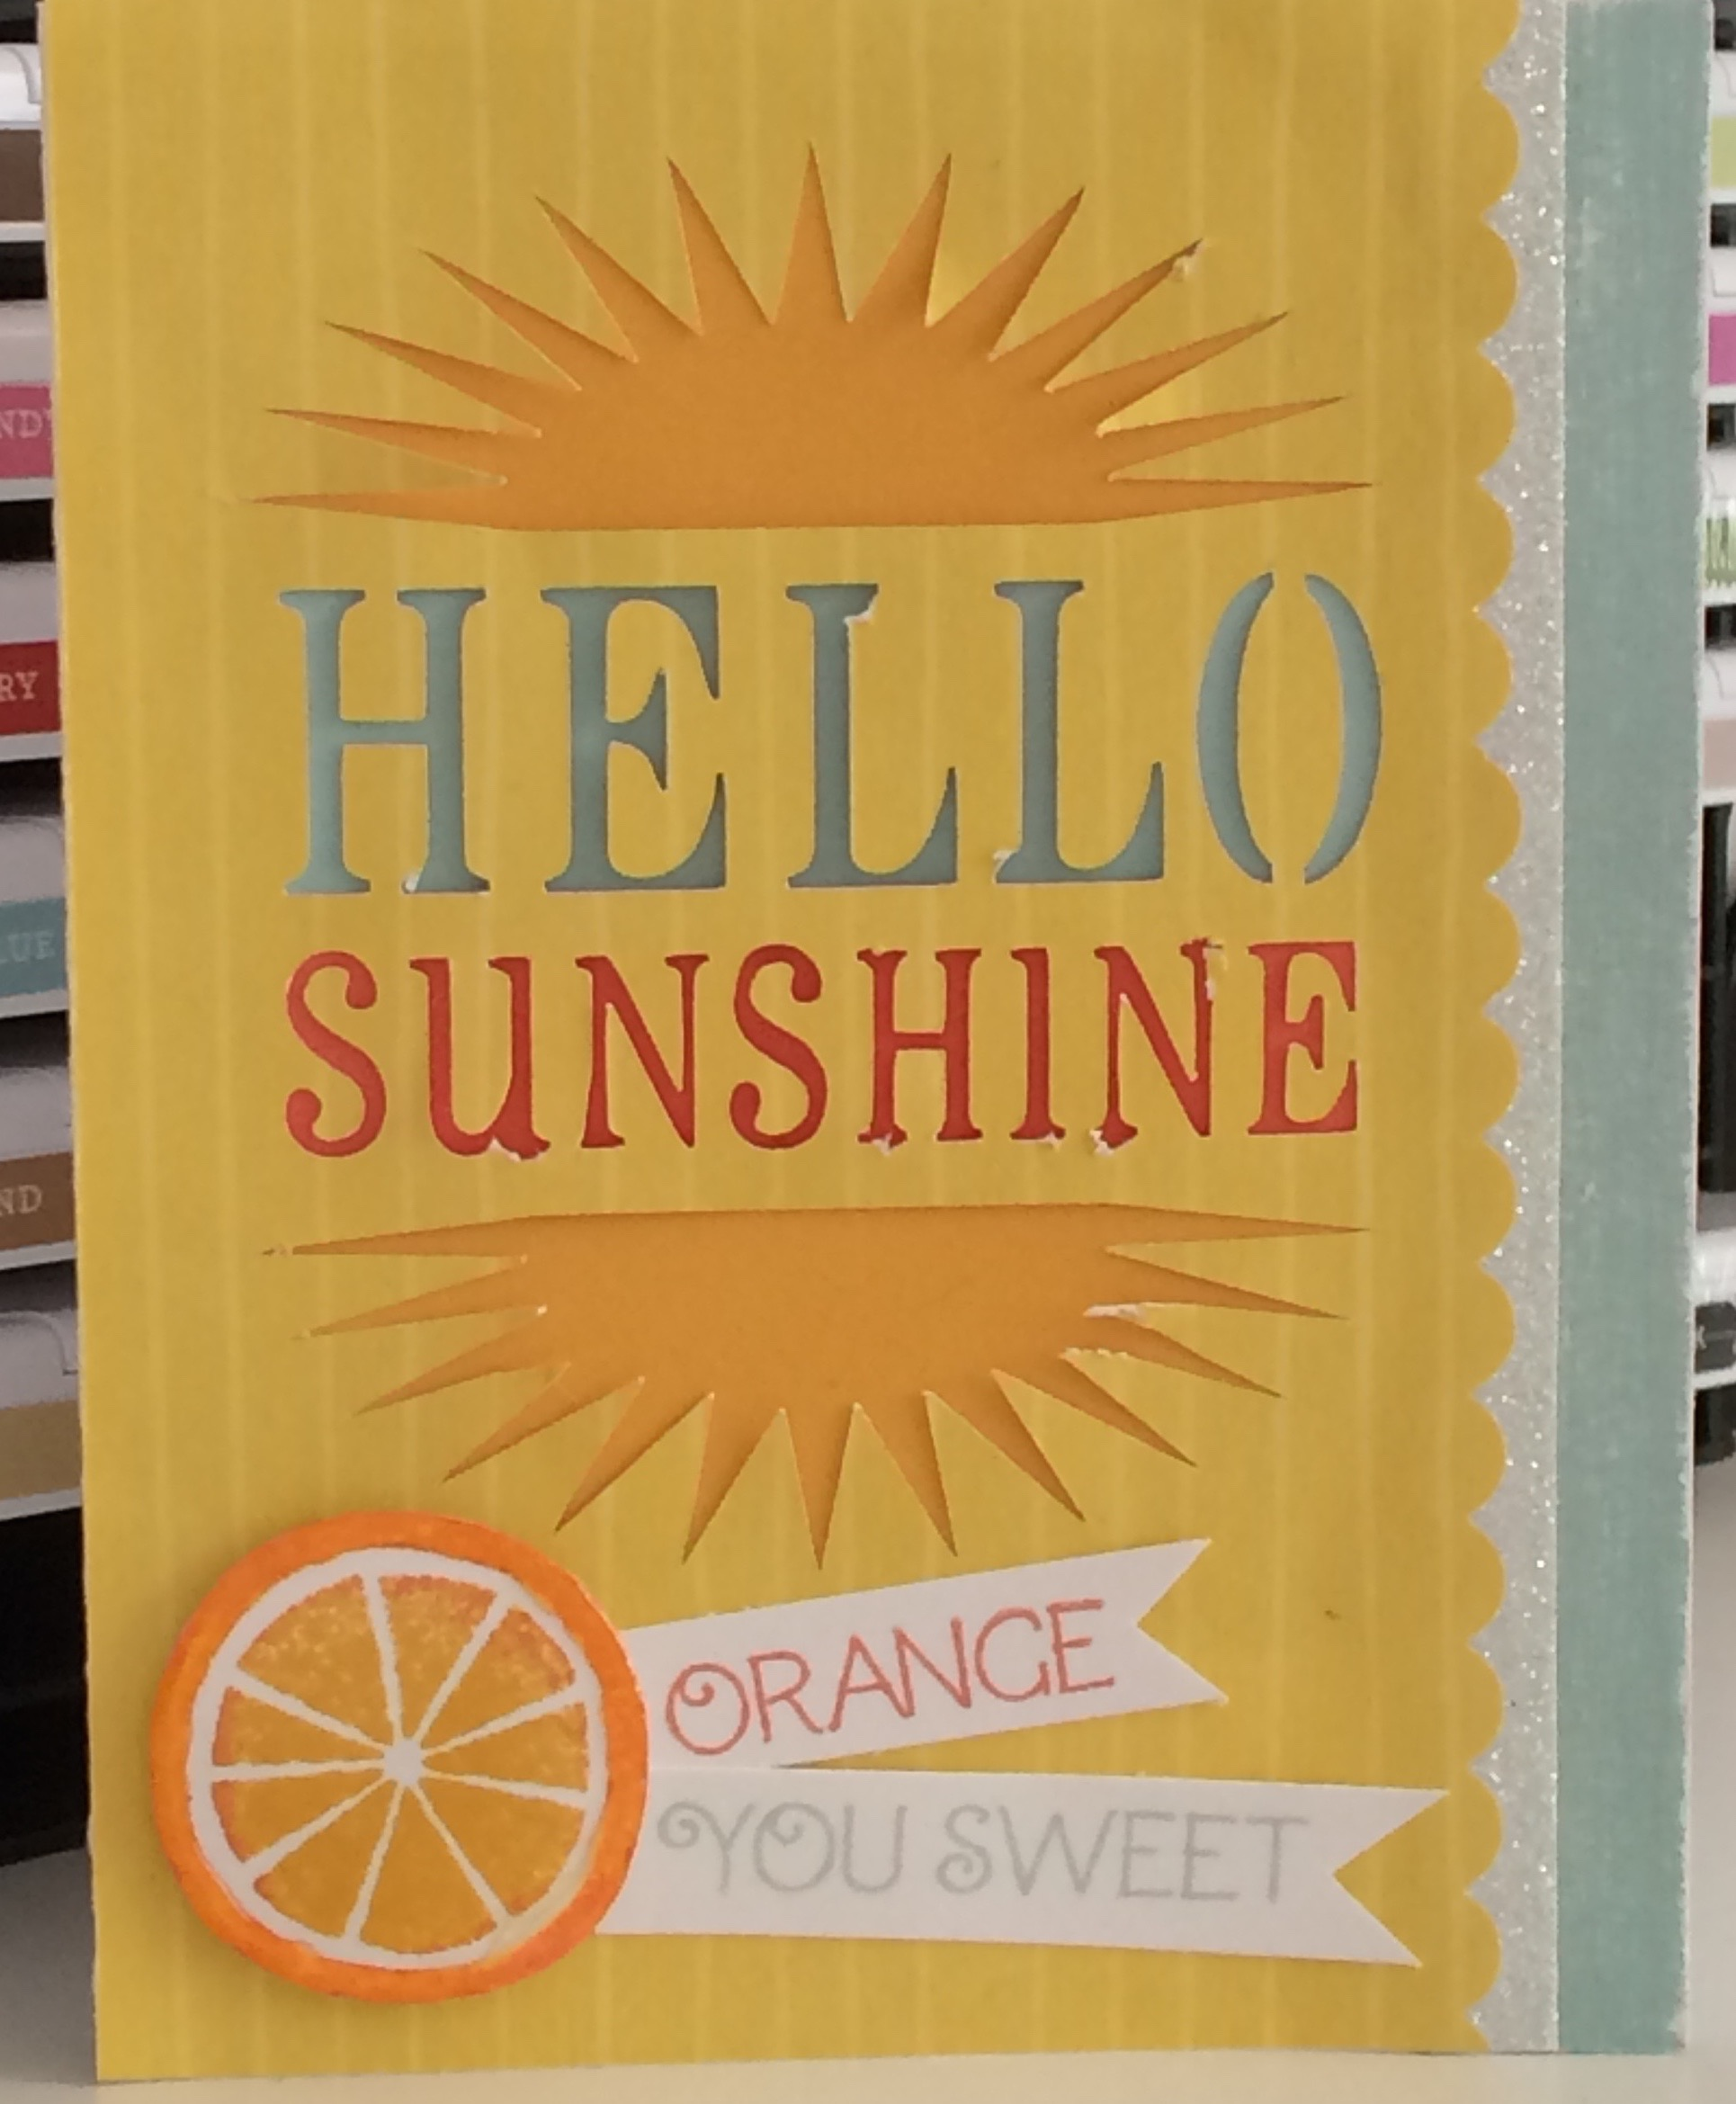 Hello Citrus Sunshine